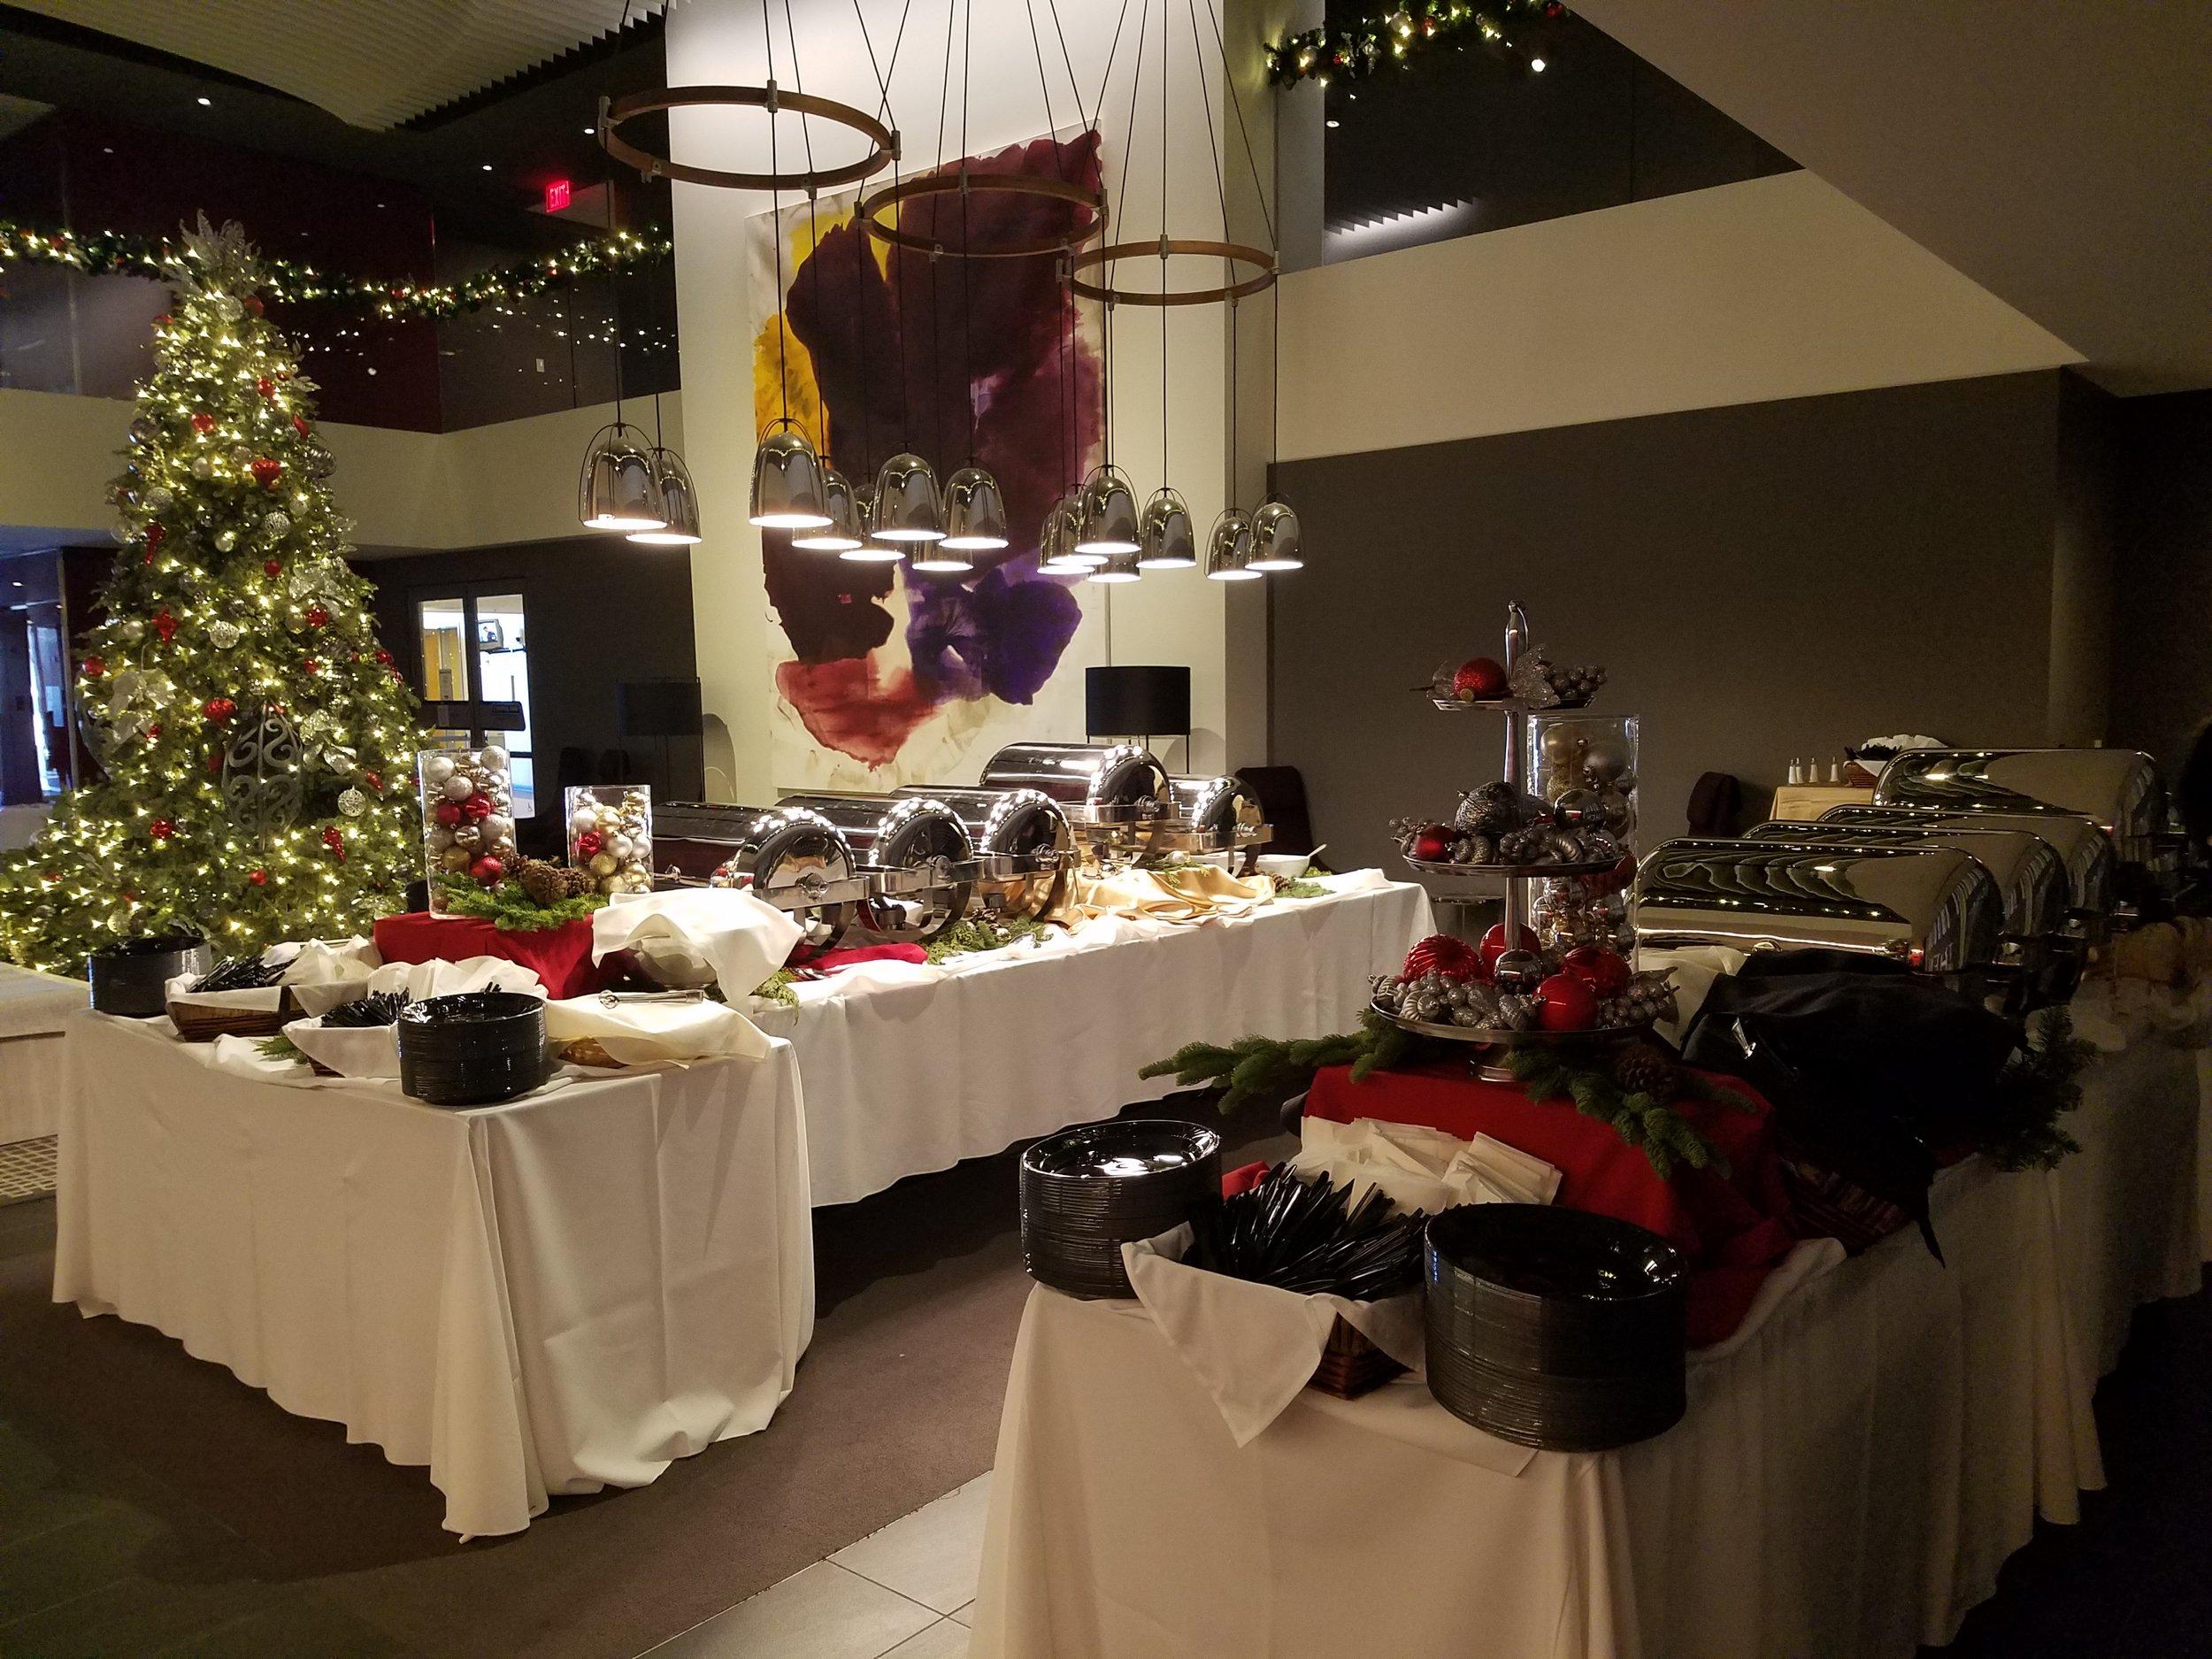 Corporate Event Catering in Santa Barbara, CA